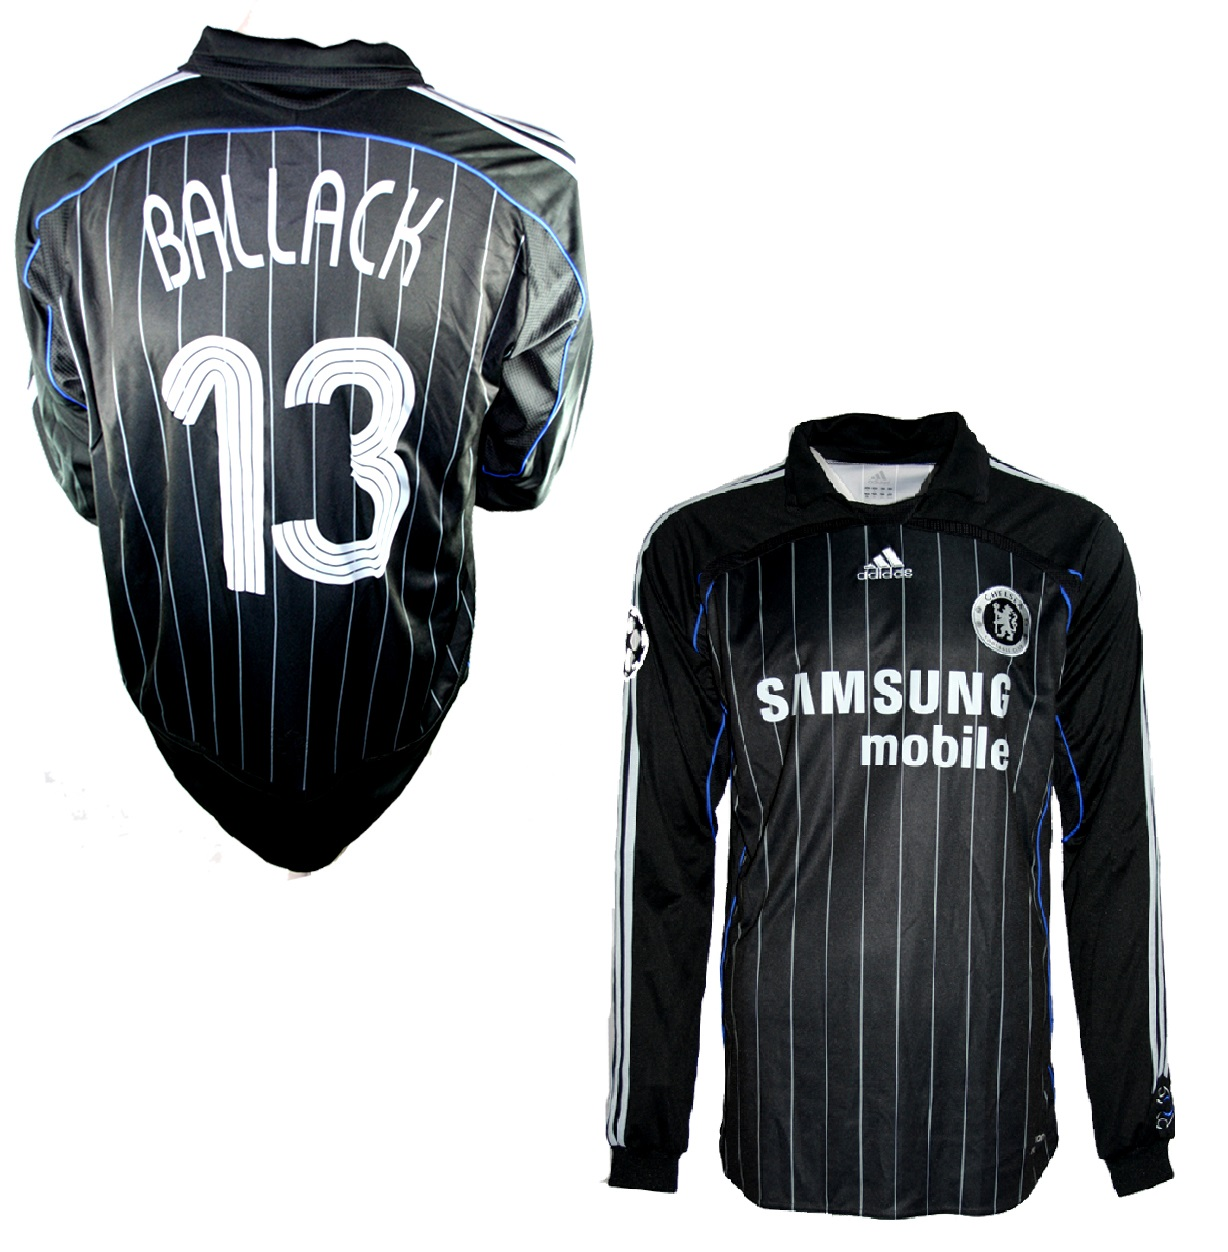 the latest 941fd 26659 Adidas FC Chelsea London jersey 13 Michael Ballack 2006/07 ...